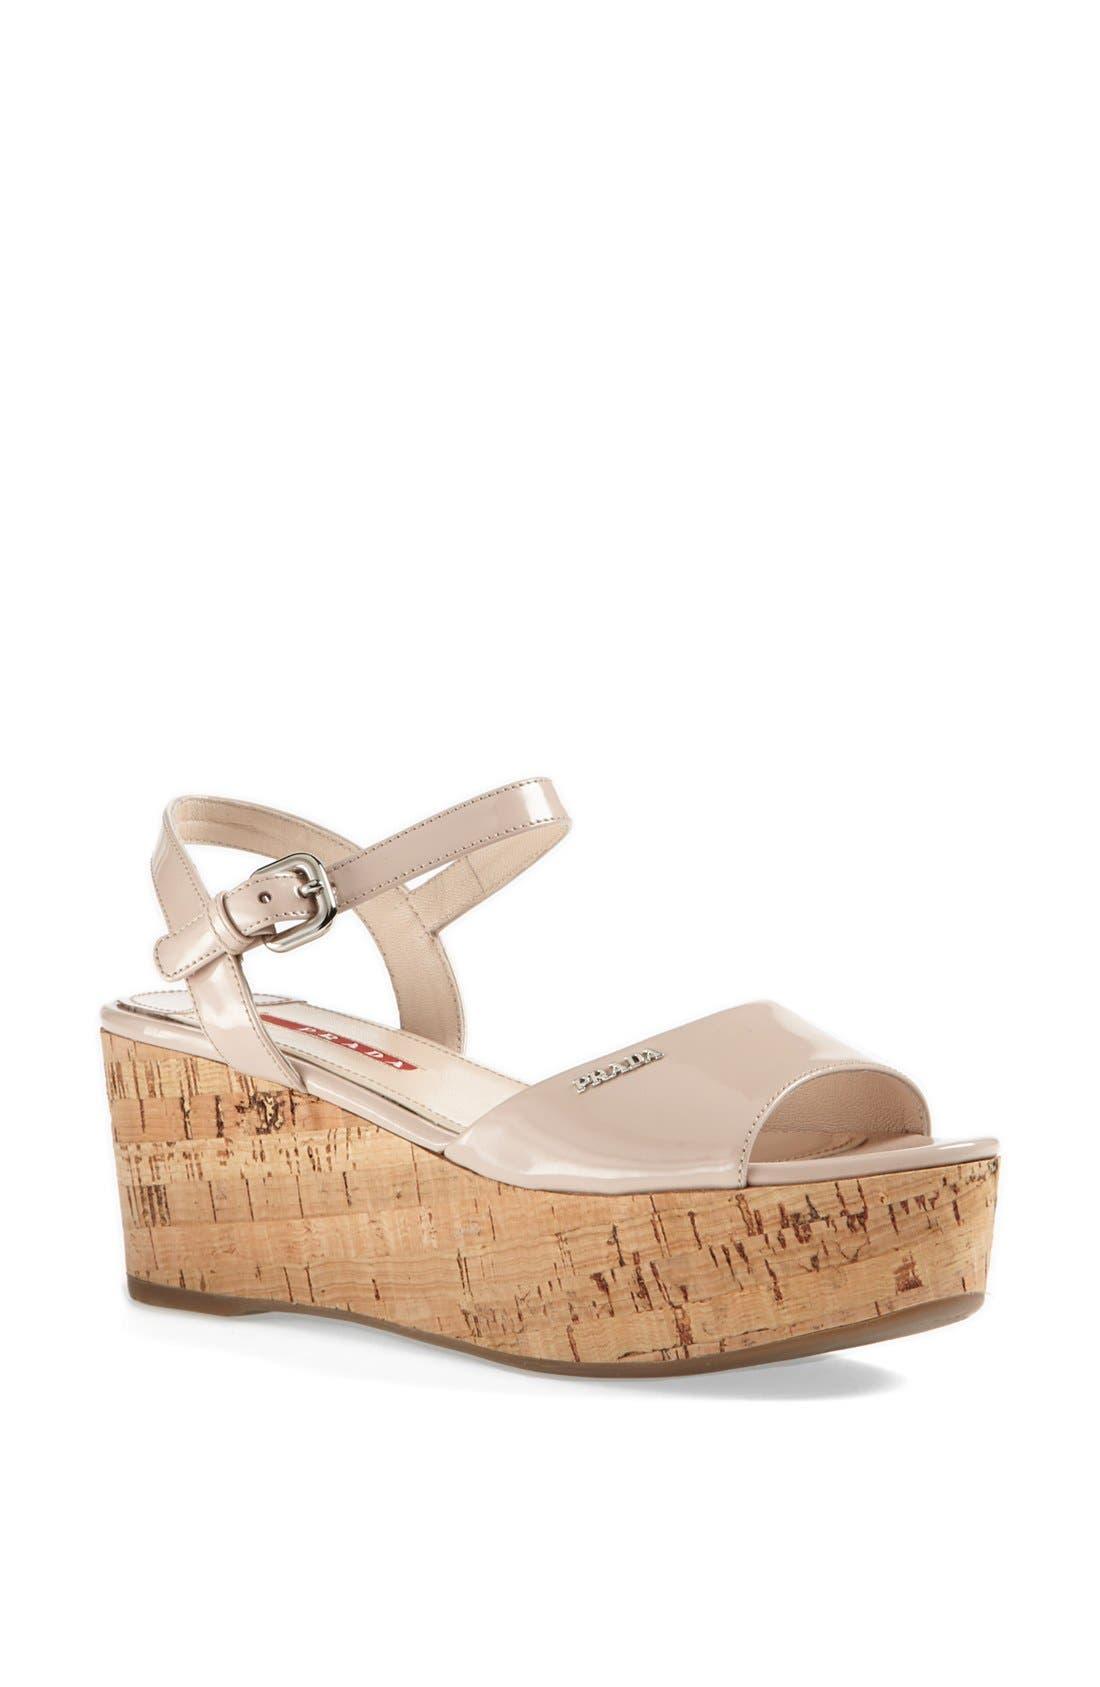 Alternate Image 1 Selected - Prada Quarter Strap Platform Sandal